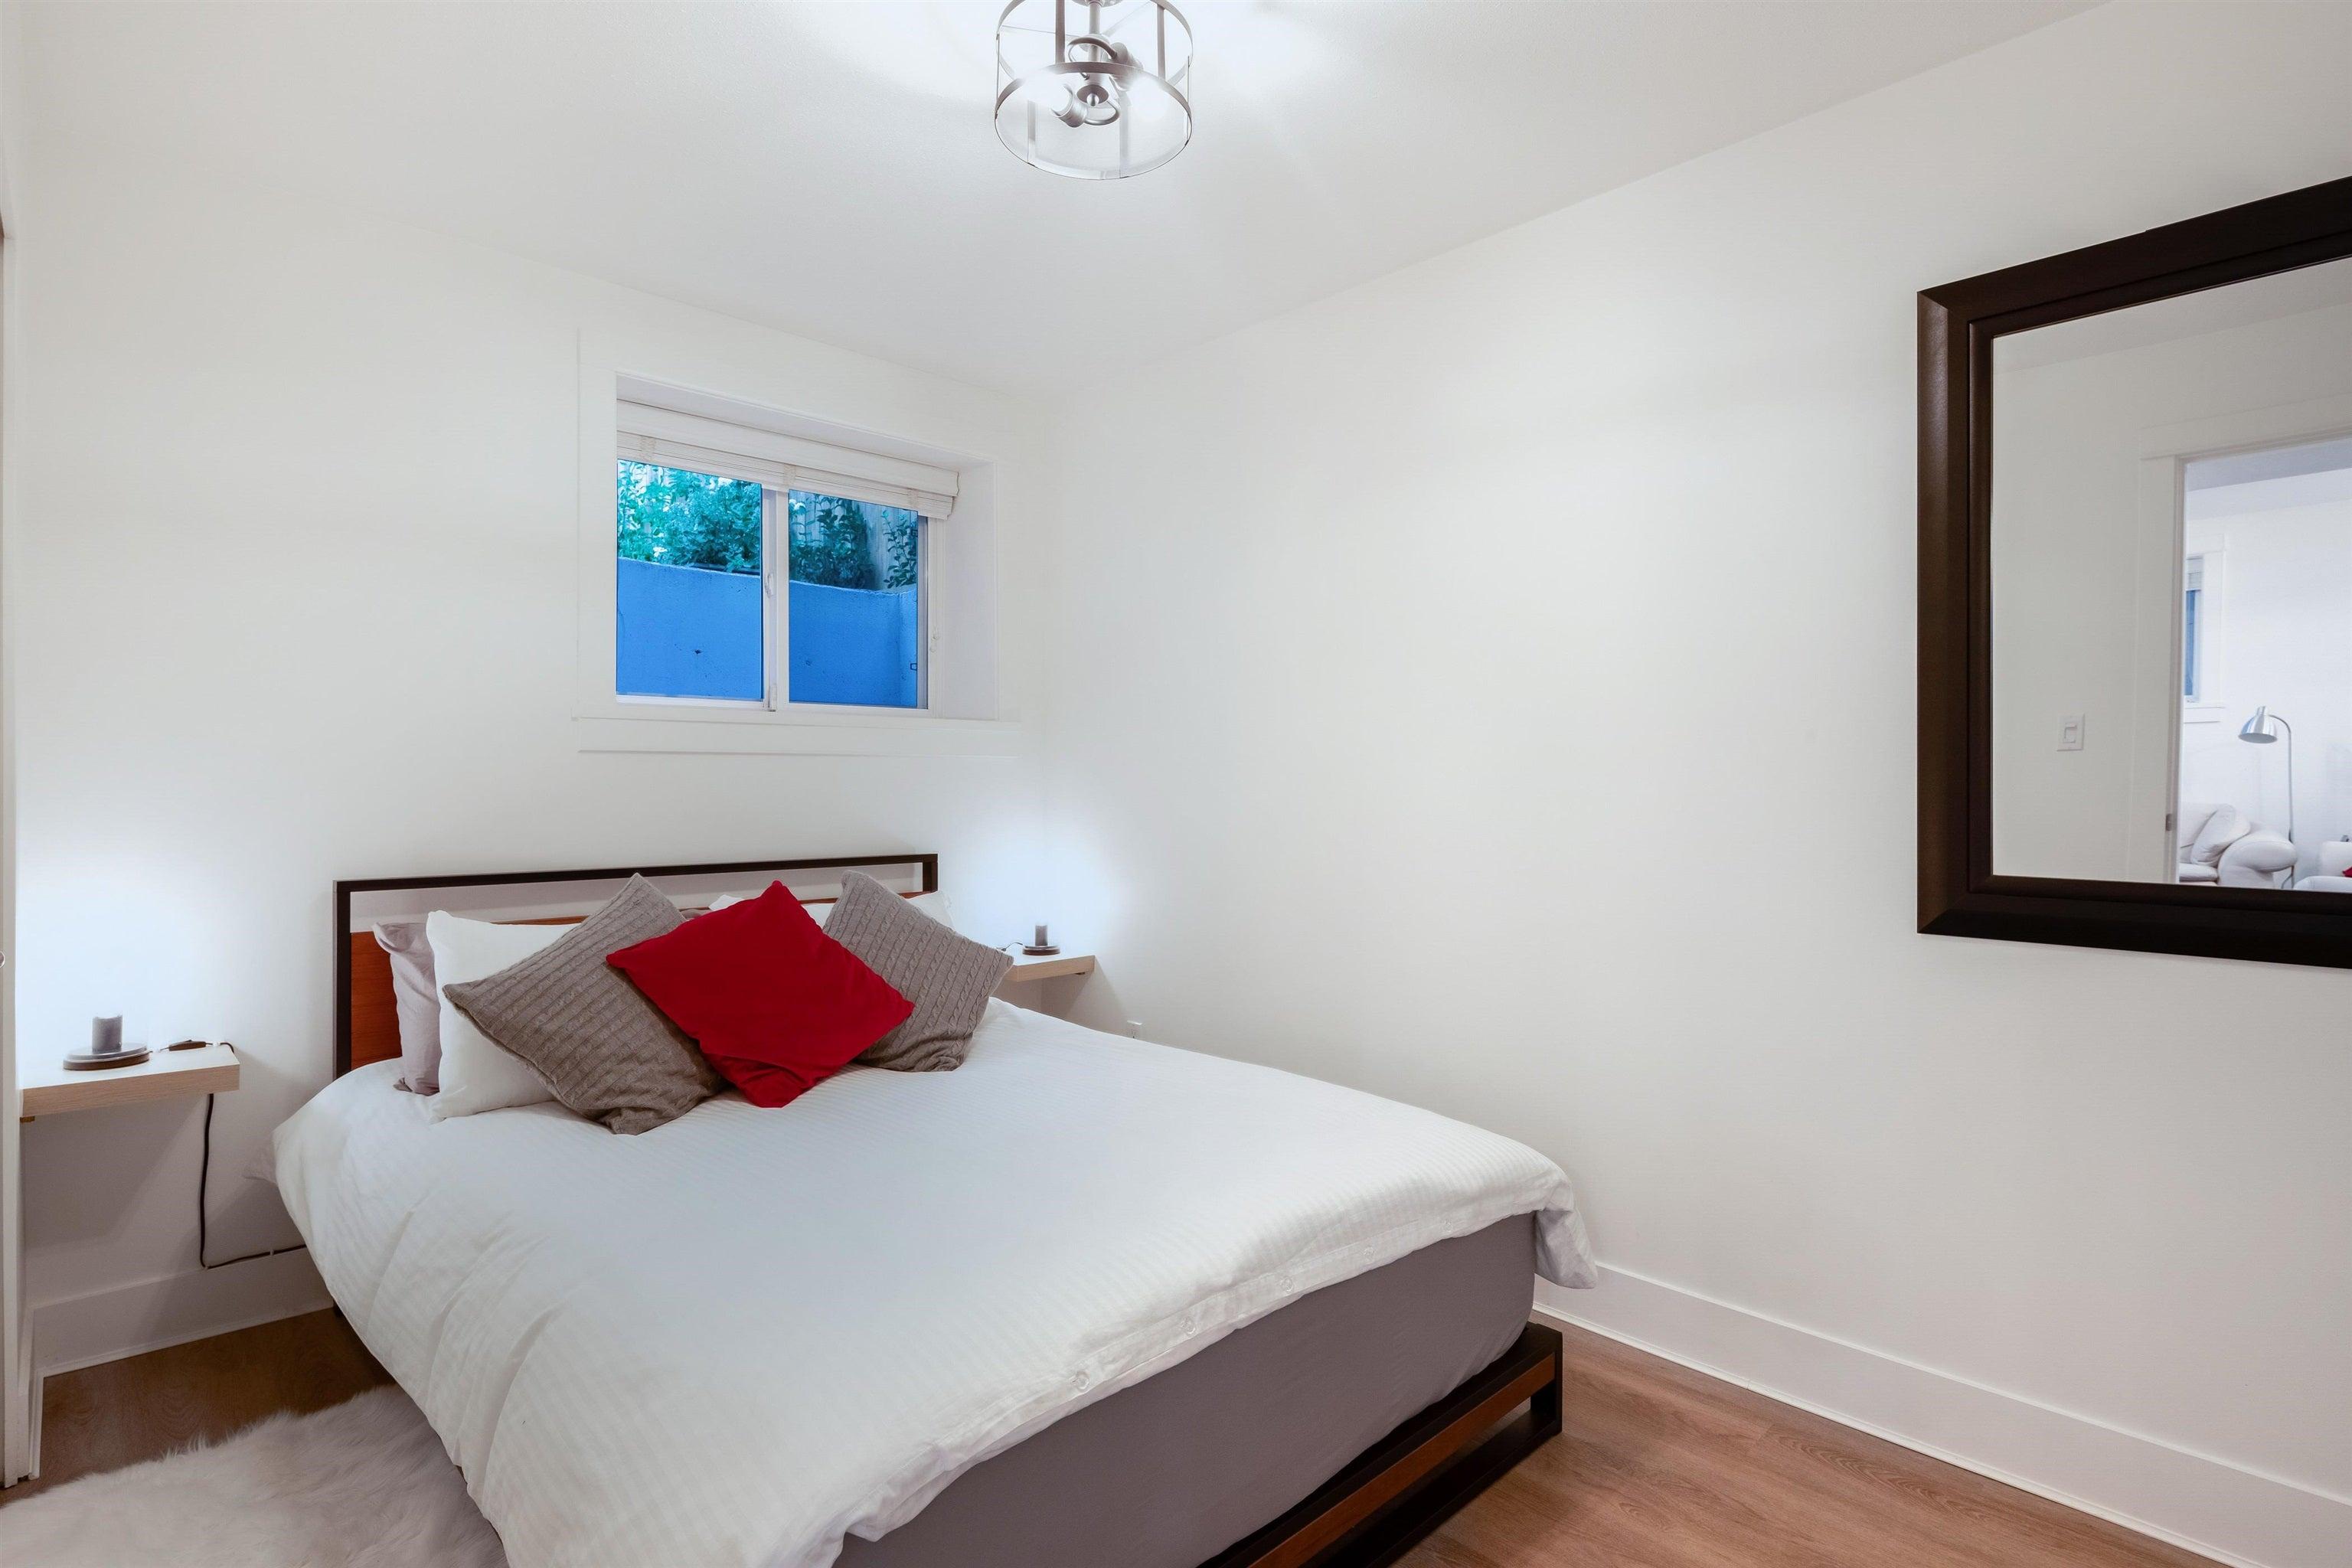 2258 WINDRIDGE DRIVE - Seymour NV House/Single Family for sale, 5 Bedrooms (R2617156) - #34